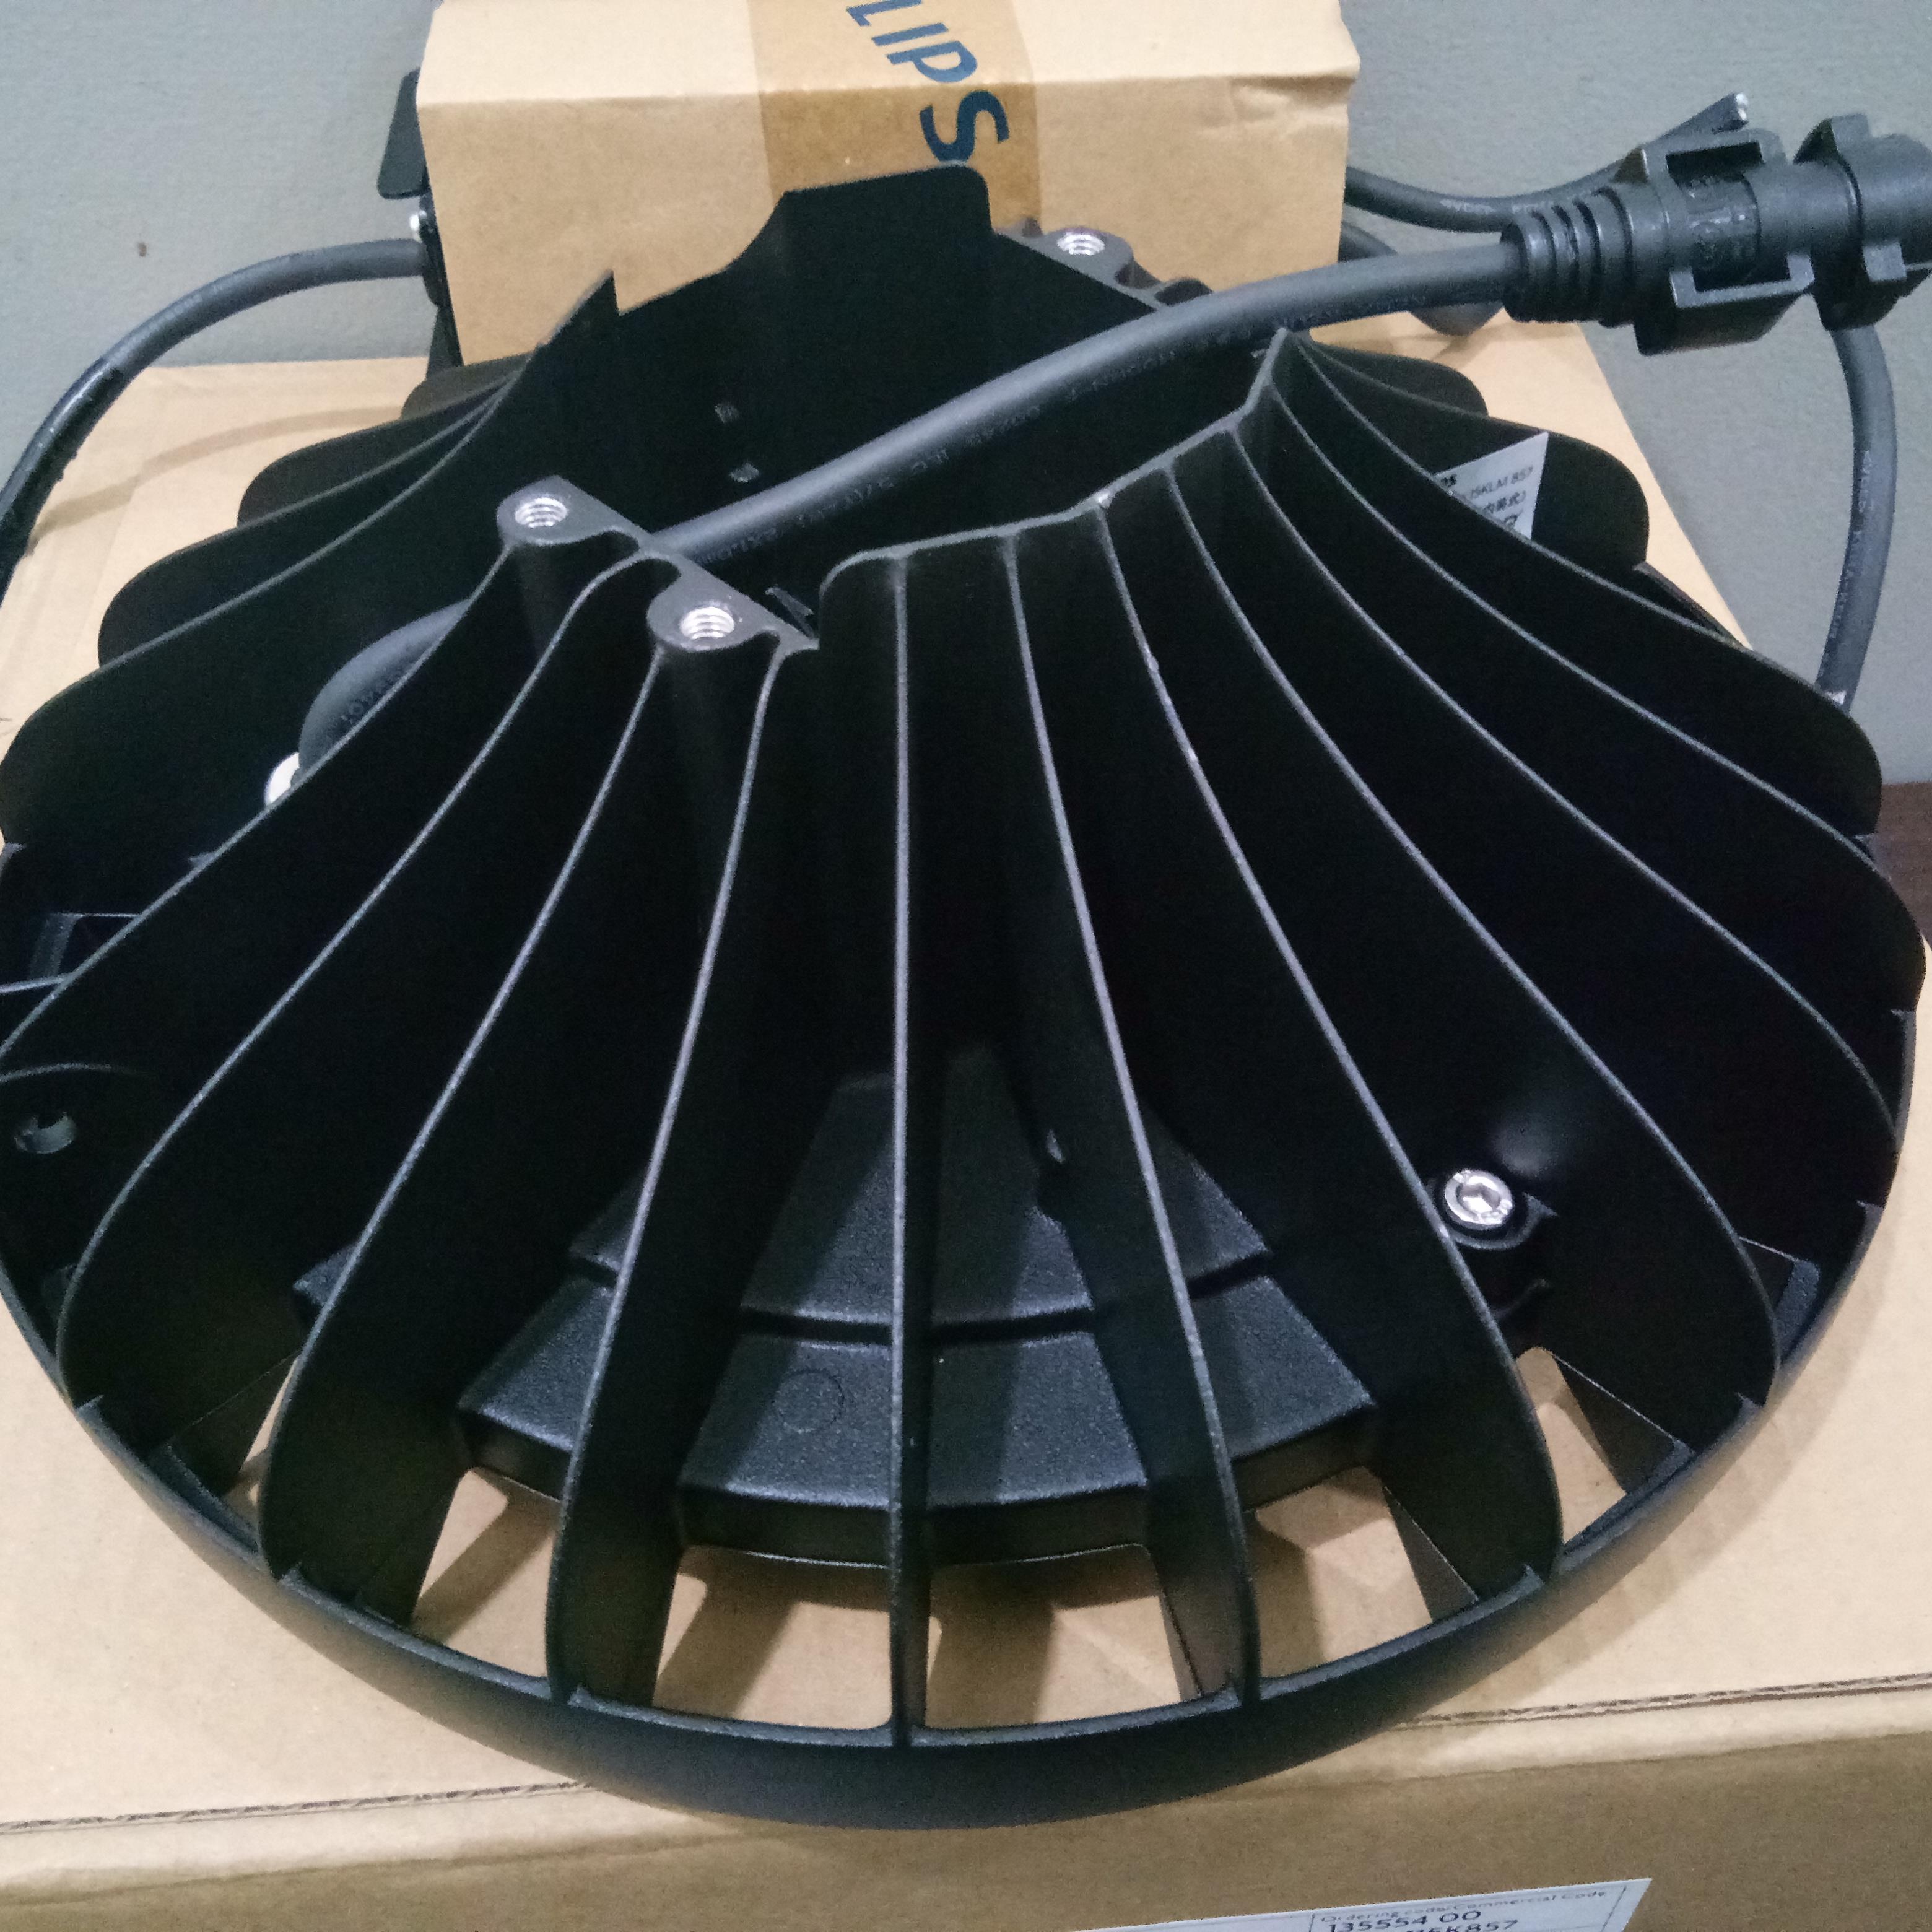 Jual Lampu Industri High Bay LED Philips Fortimo -71W